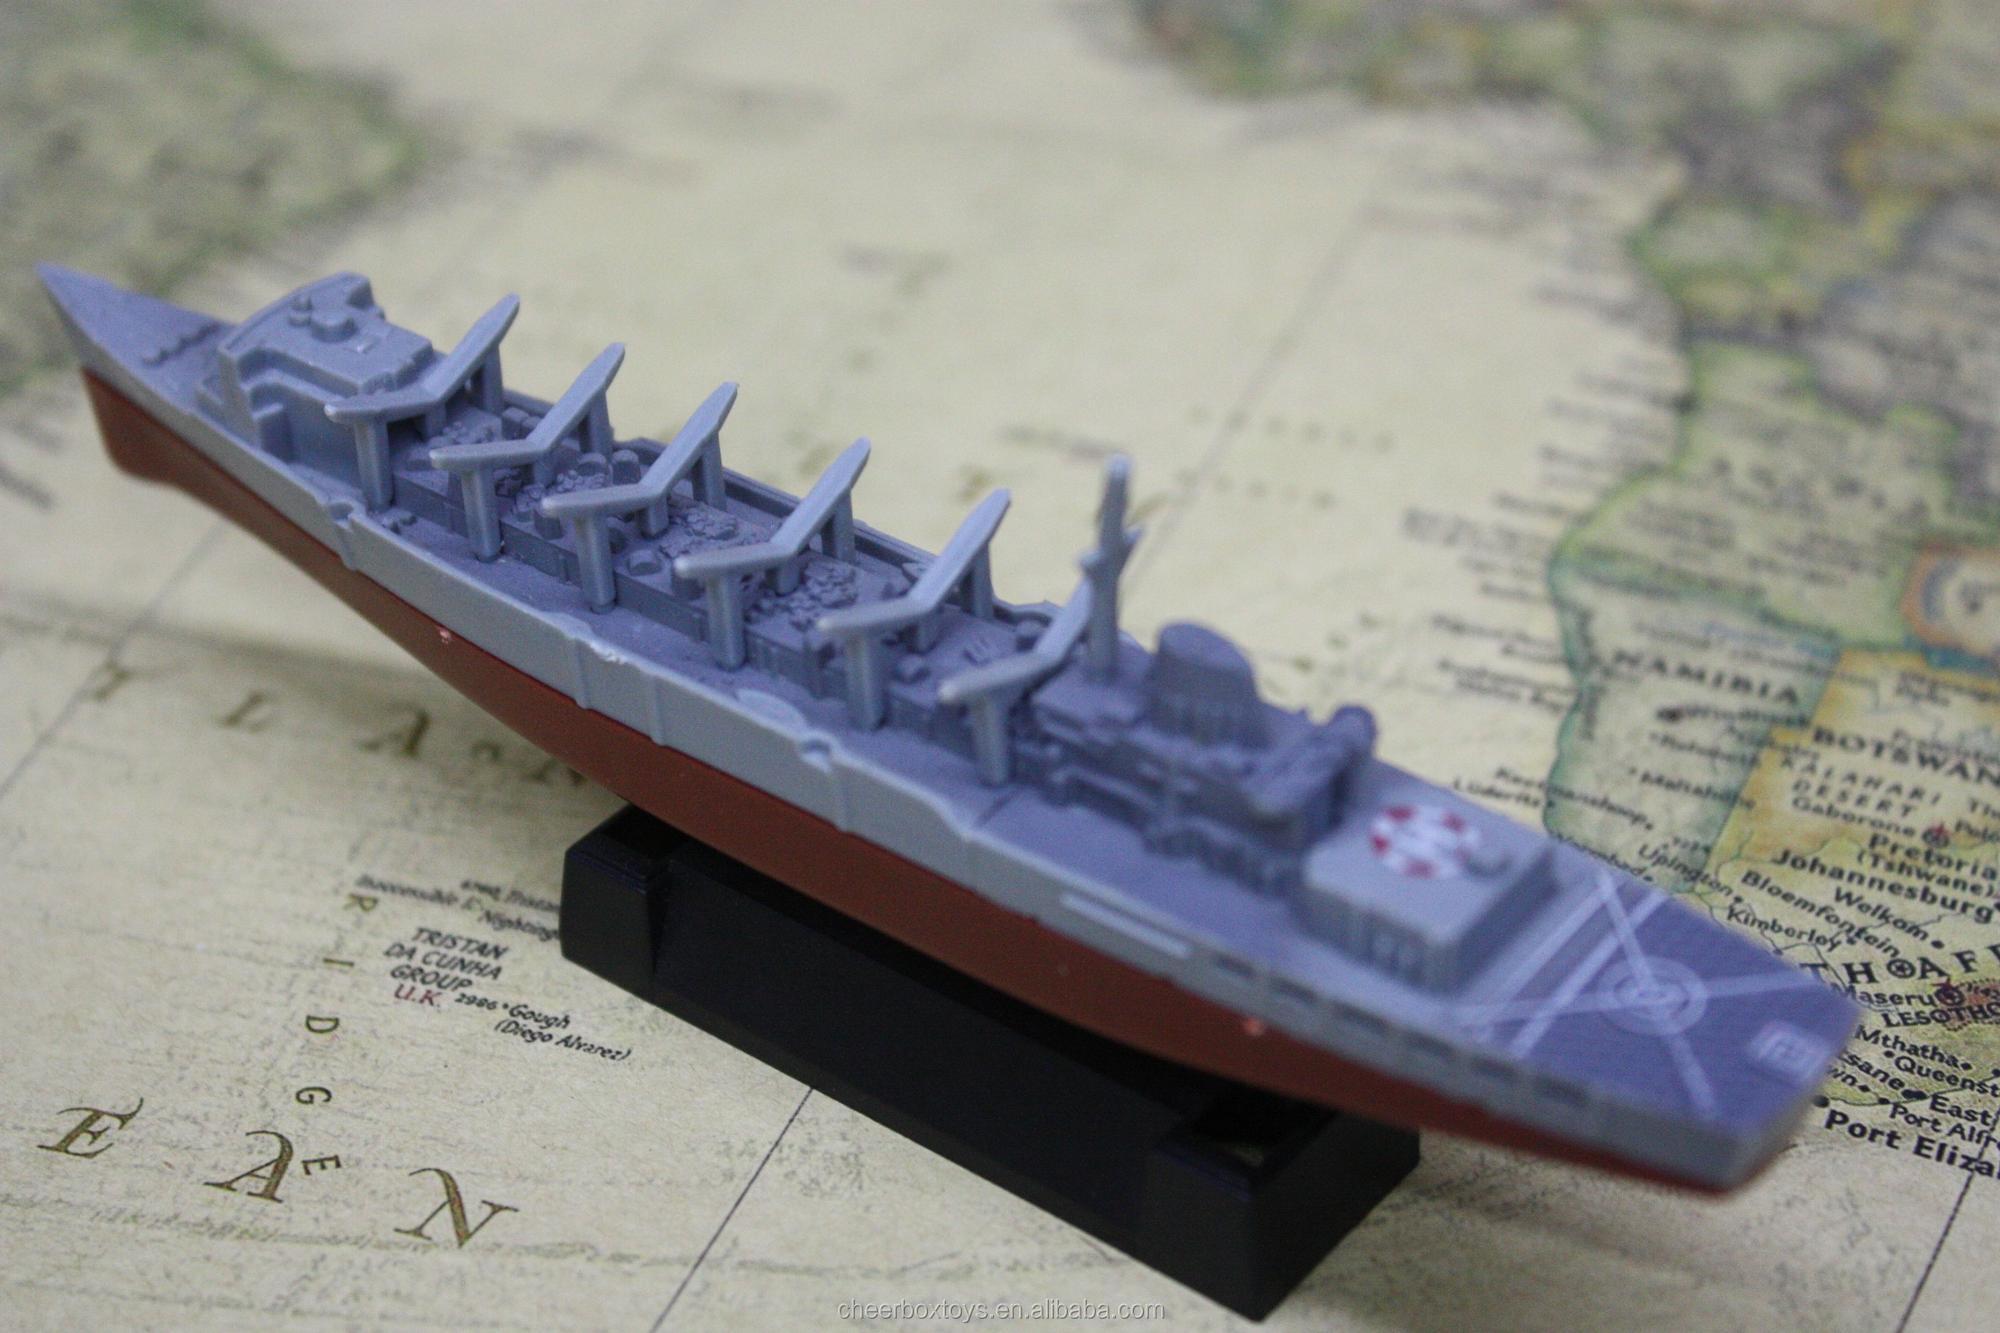 Tiny Warship Model Finger Assembly Toys Promotional Gifts mini models